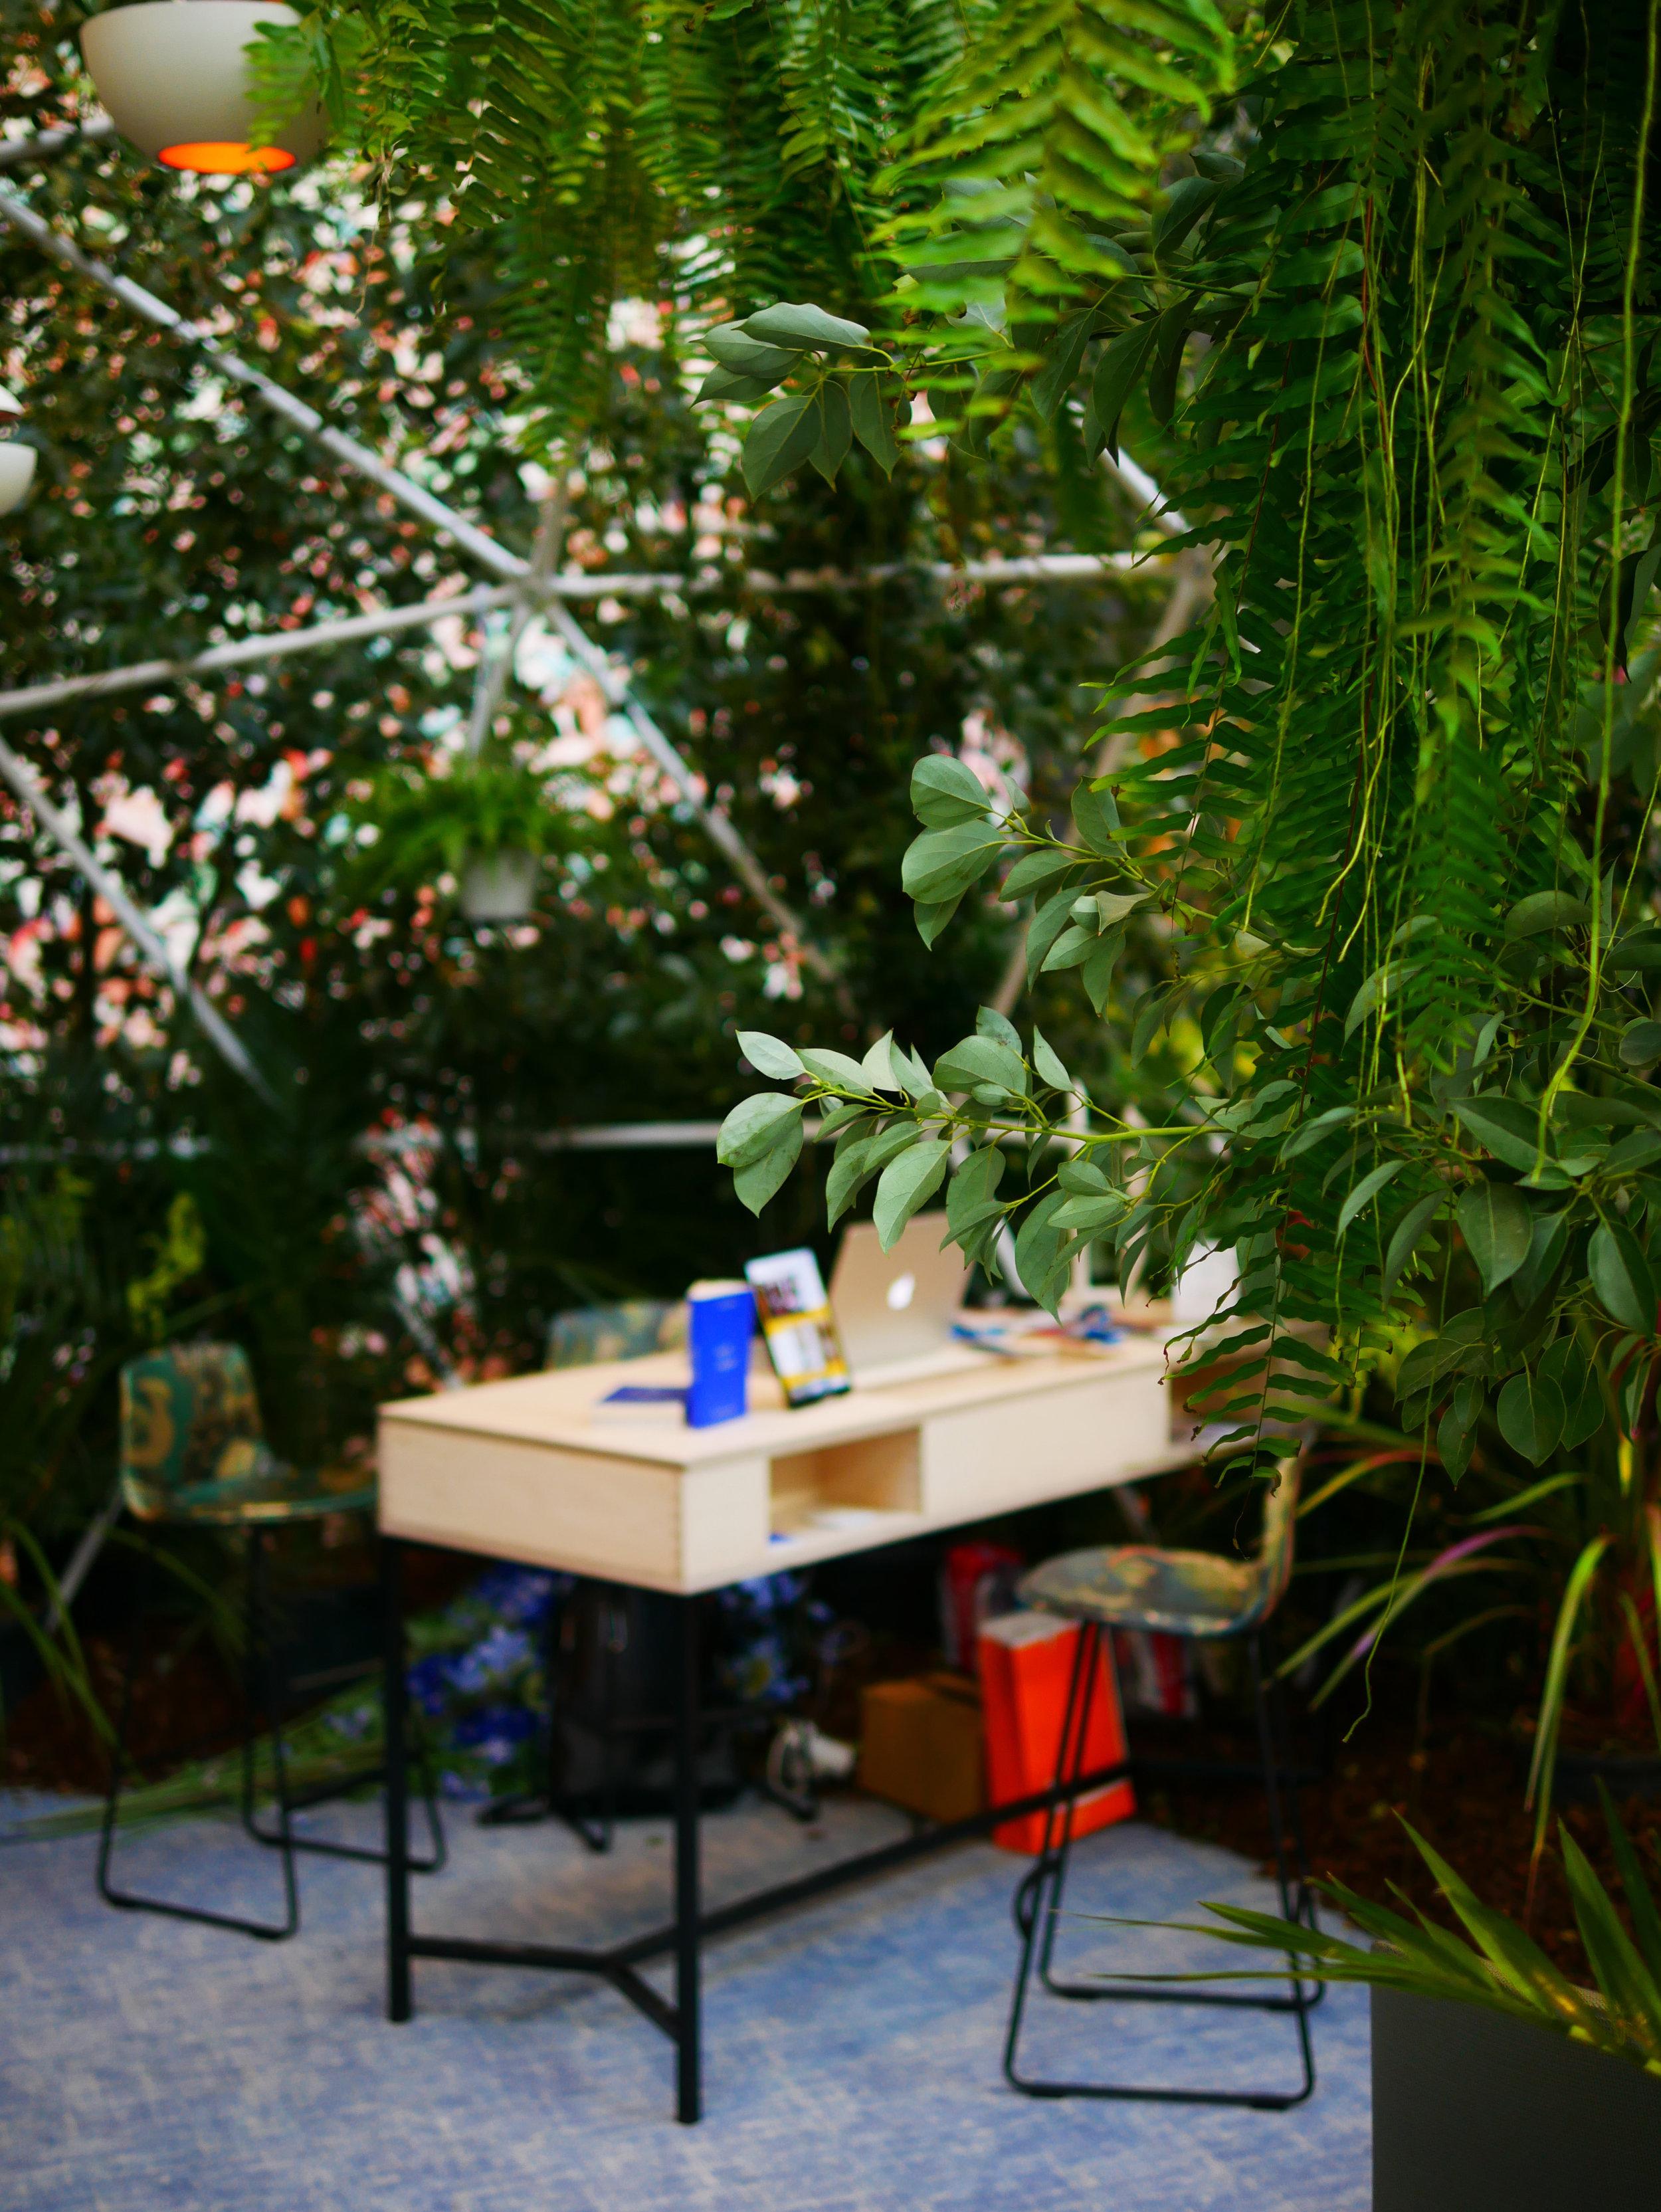 equiphotel_tradeshow_paris_terraces_gardens_outdoor_design_christophe_gautrand_landscape_9.jpg